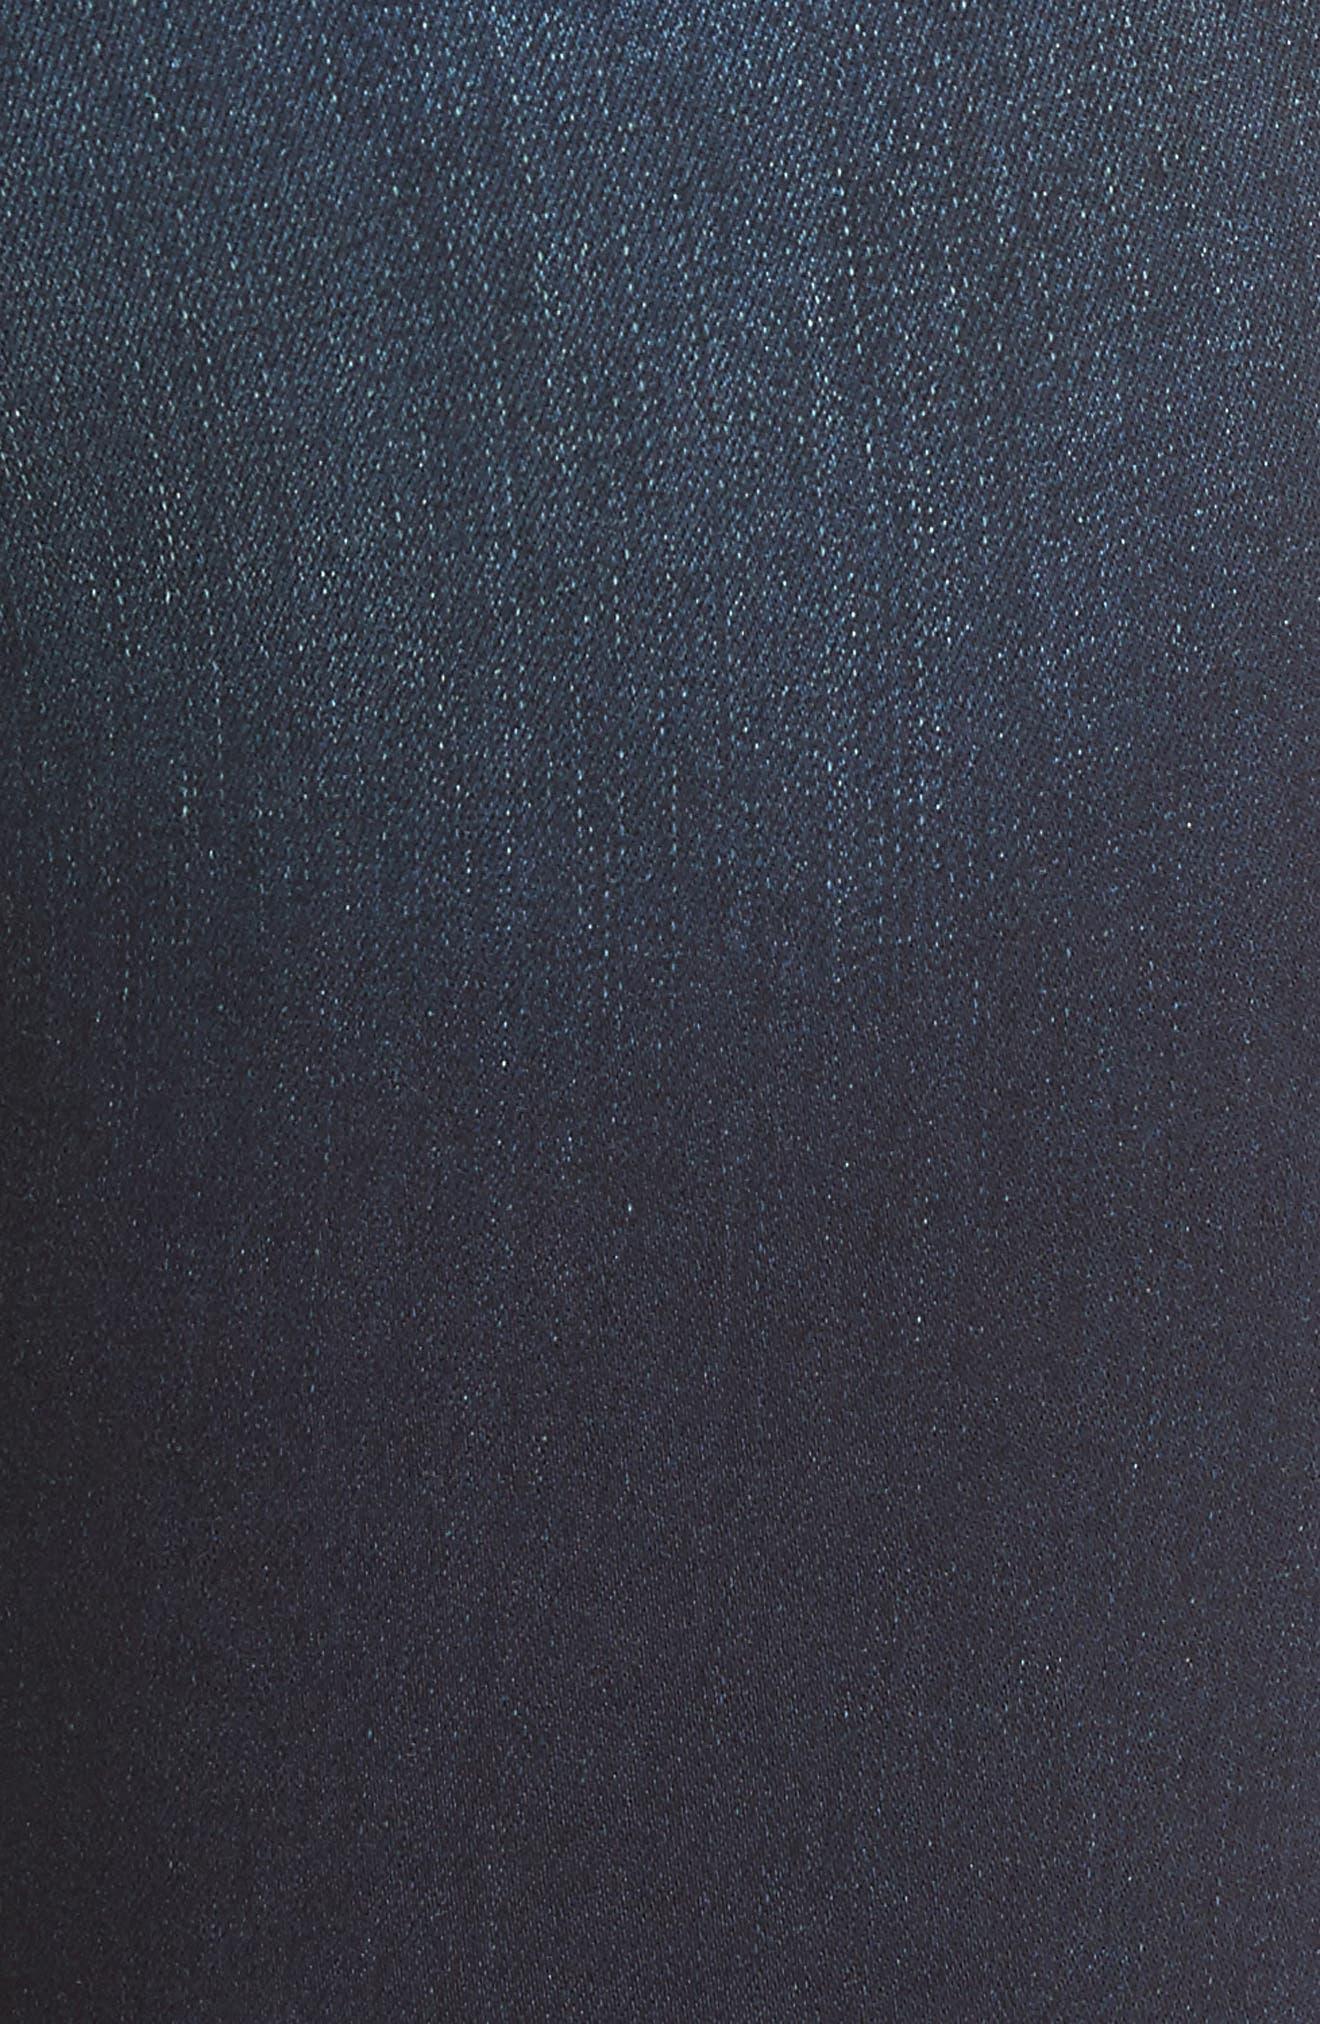 Skinny Jeans,                             Alternate thumbnail 5, color,                             PIPER